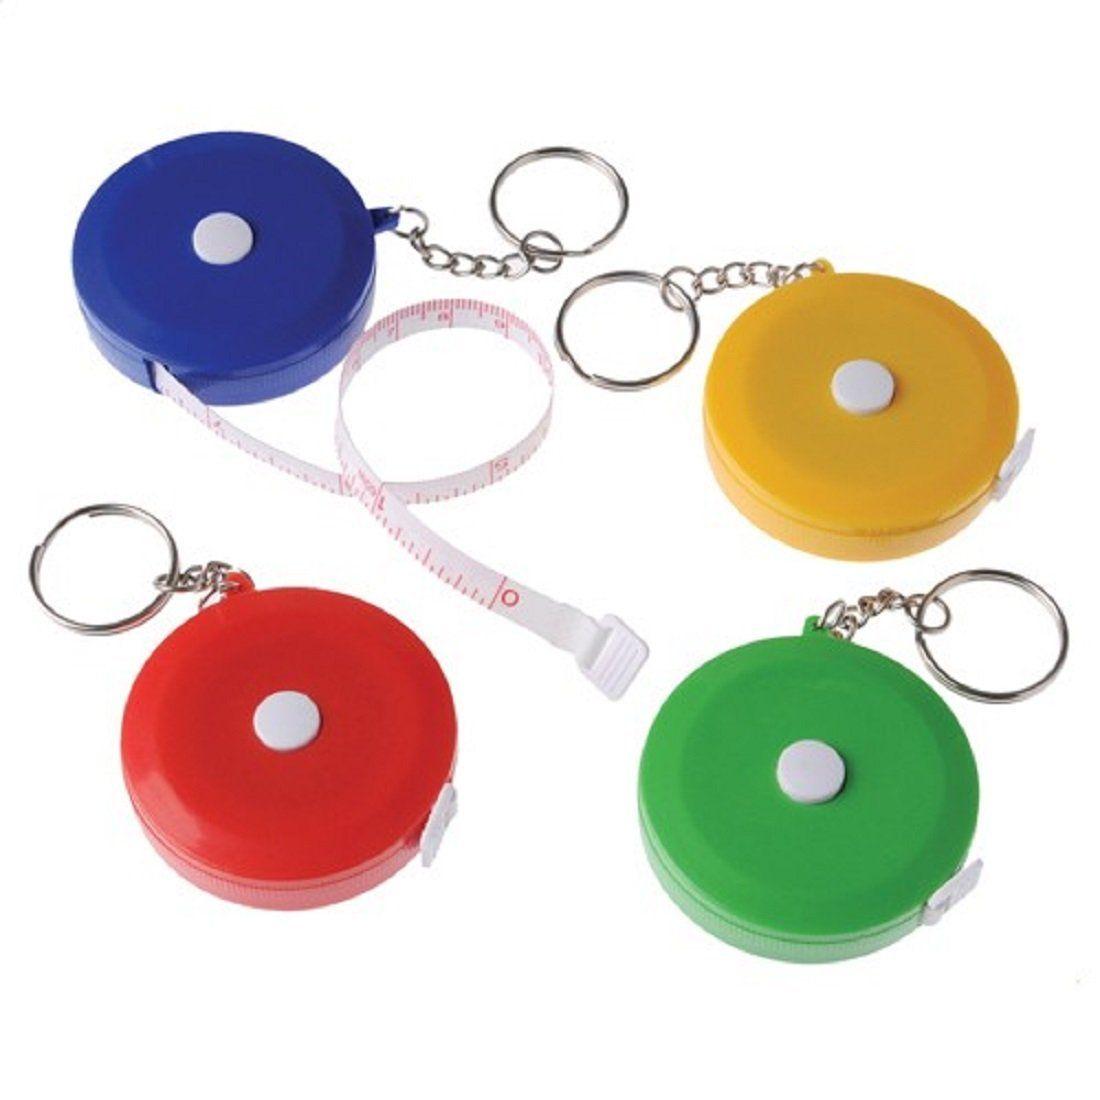 Lot Of 12 Assorted Color Mini Tape Measure Key